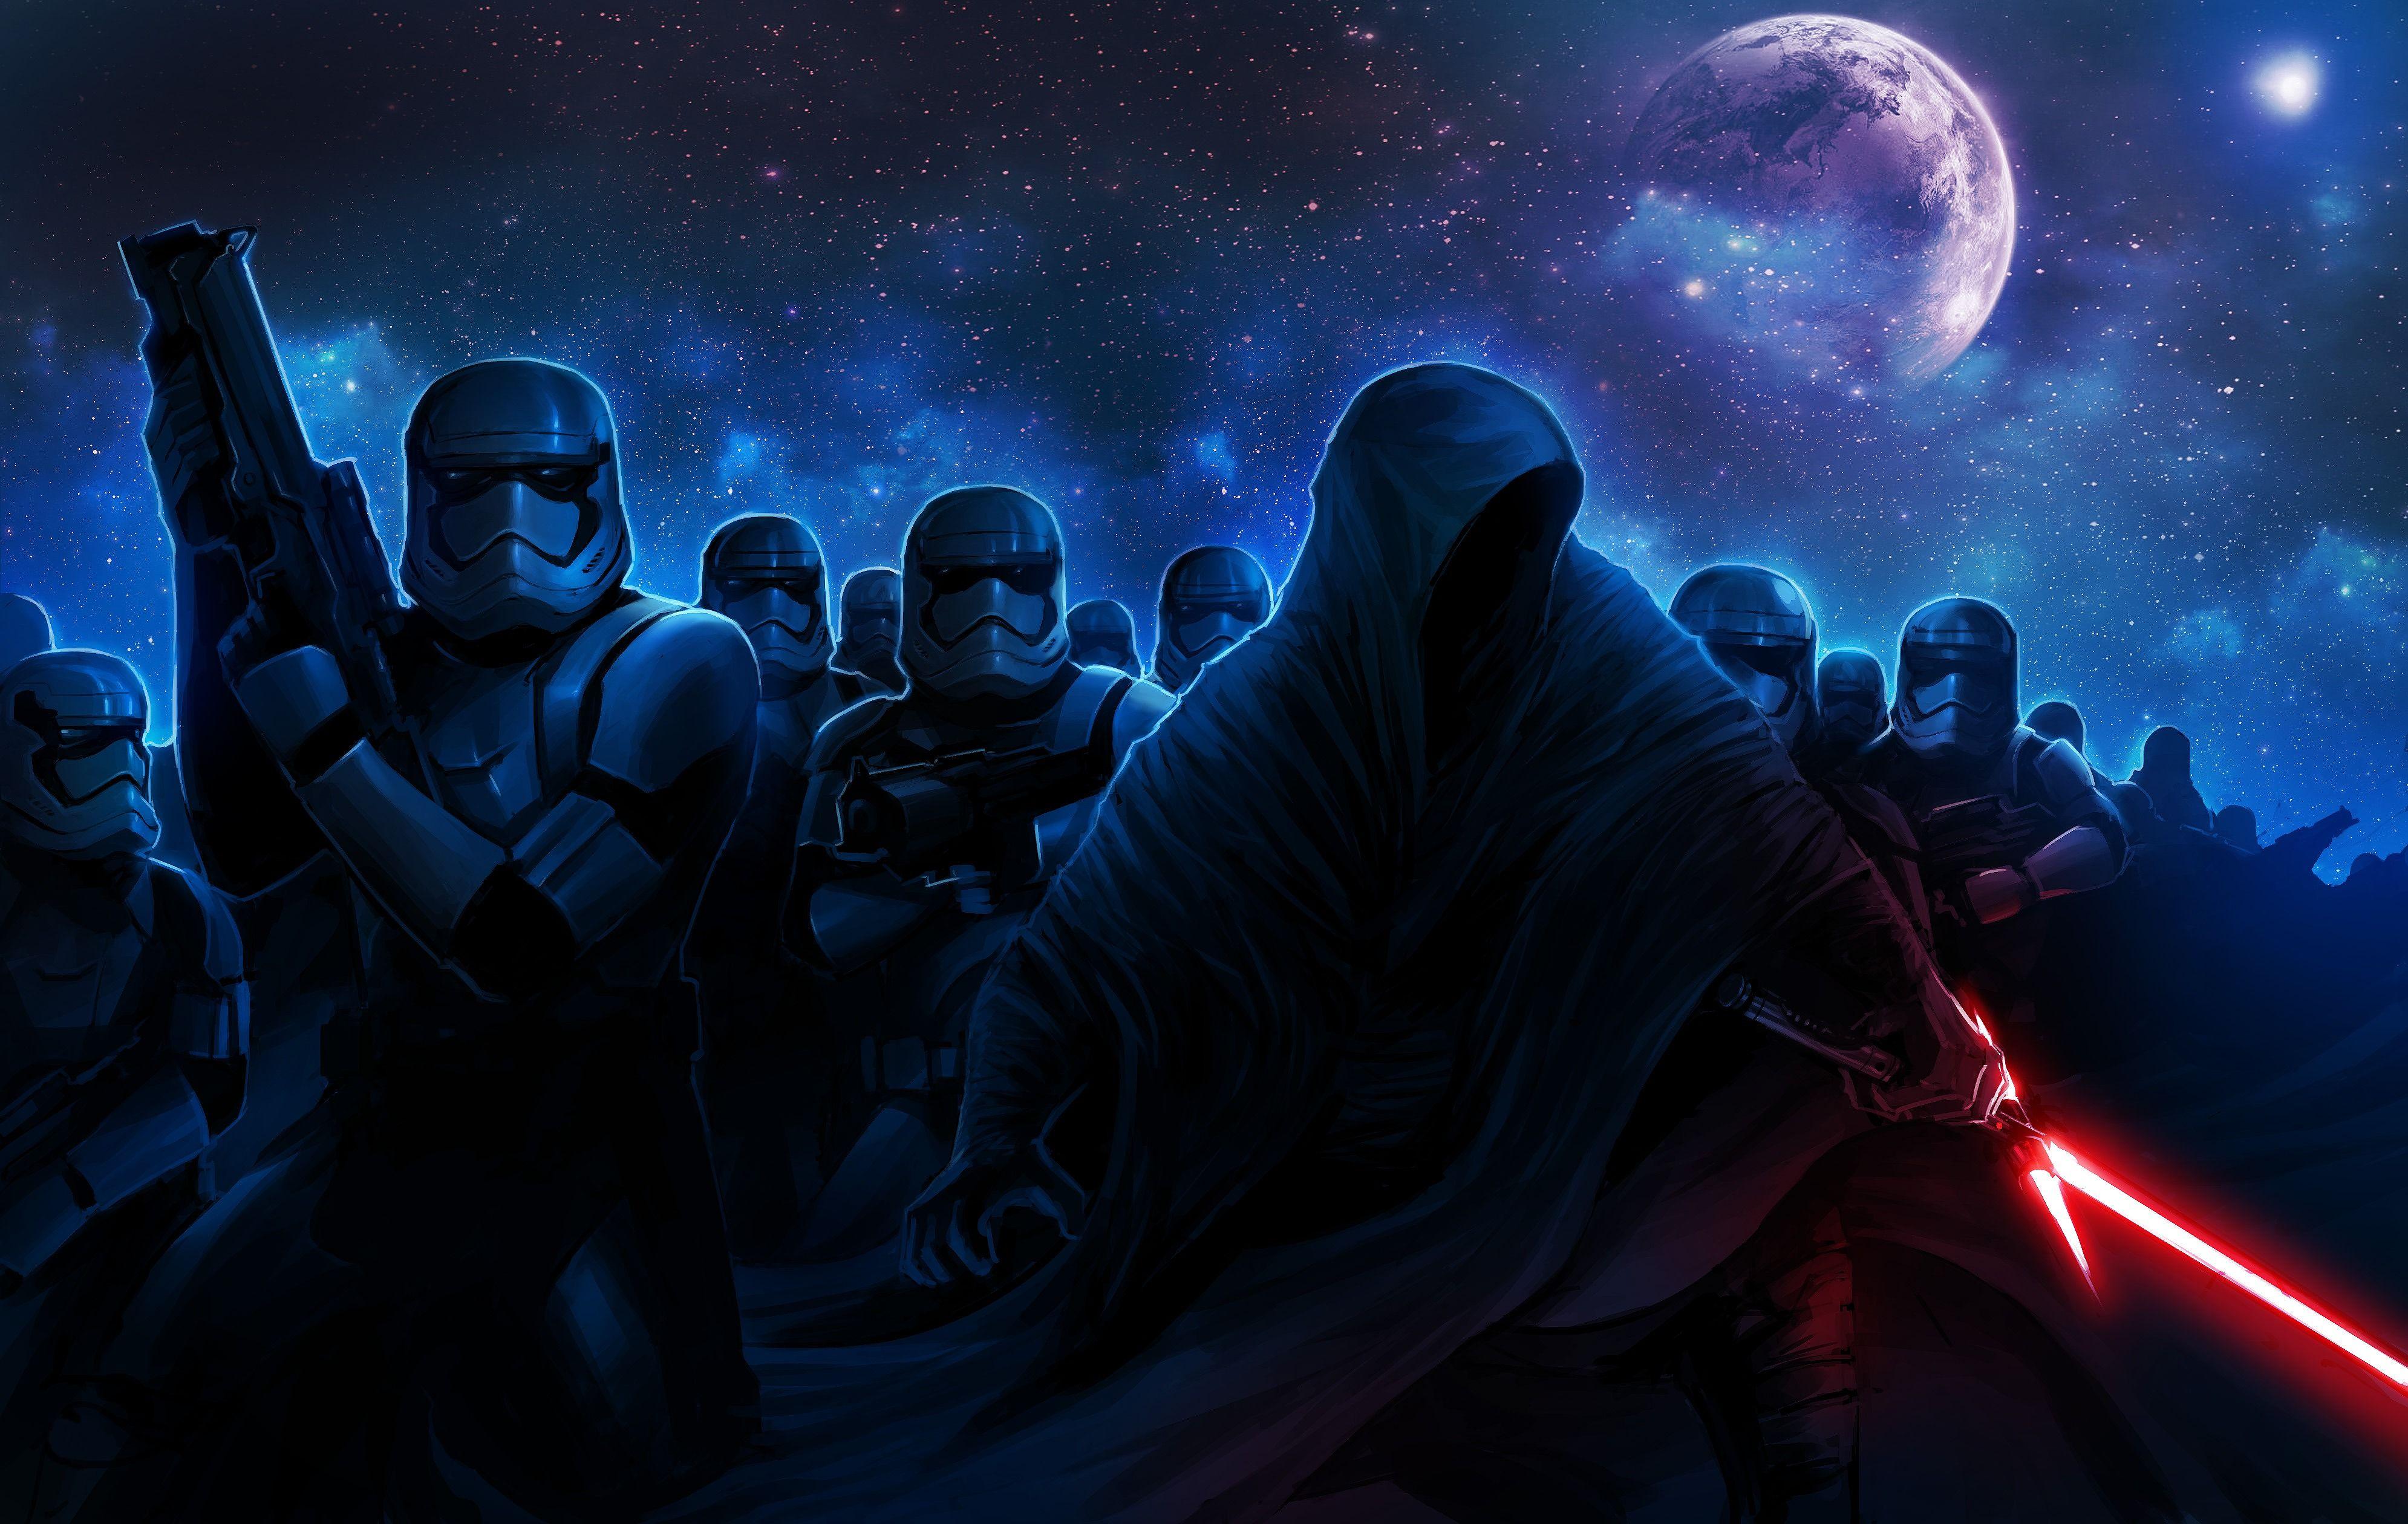 Kylo Rens Sith Secret In Star Wars Episode 7 No Midi Chlorians 3981x2520